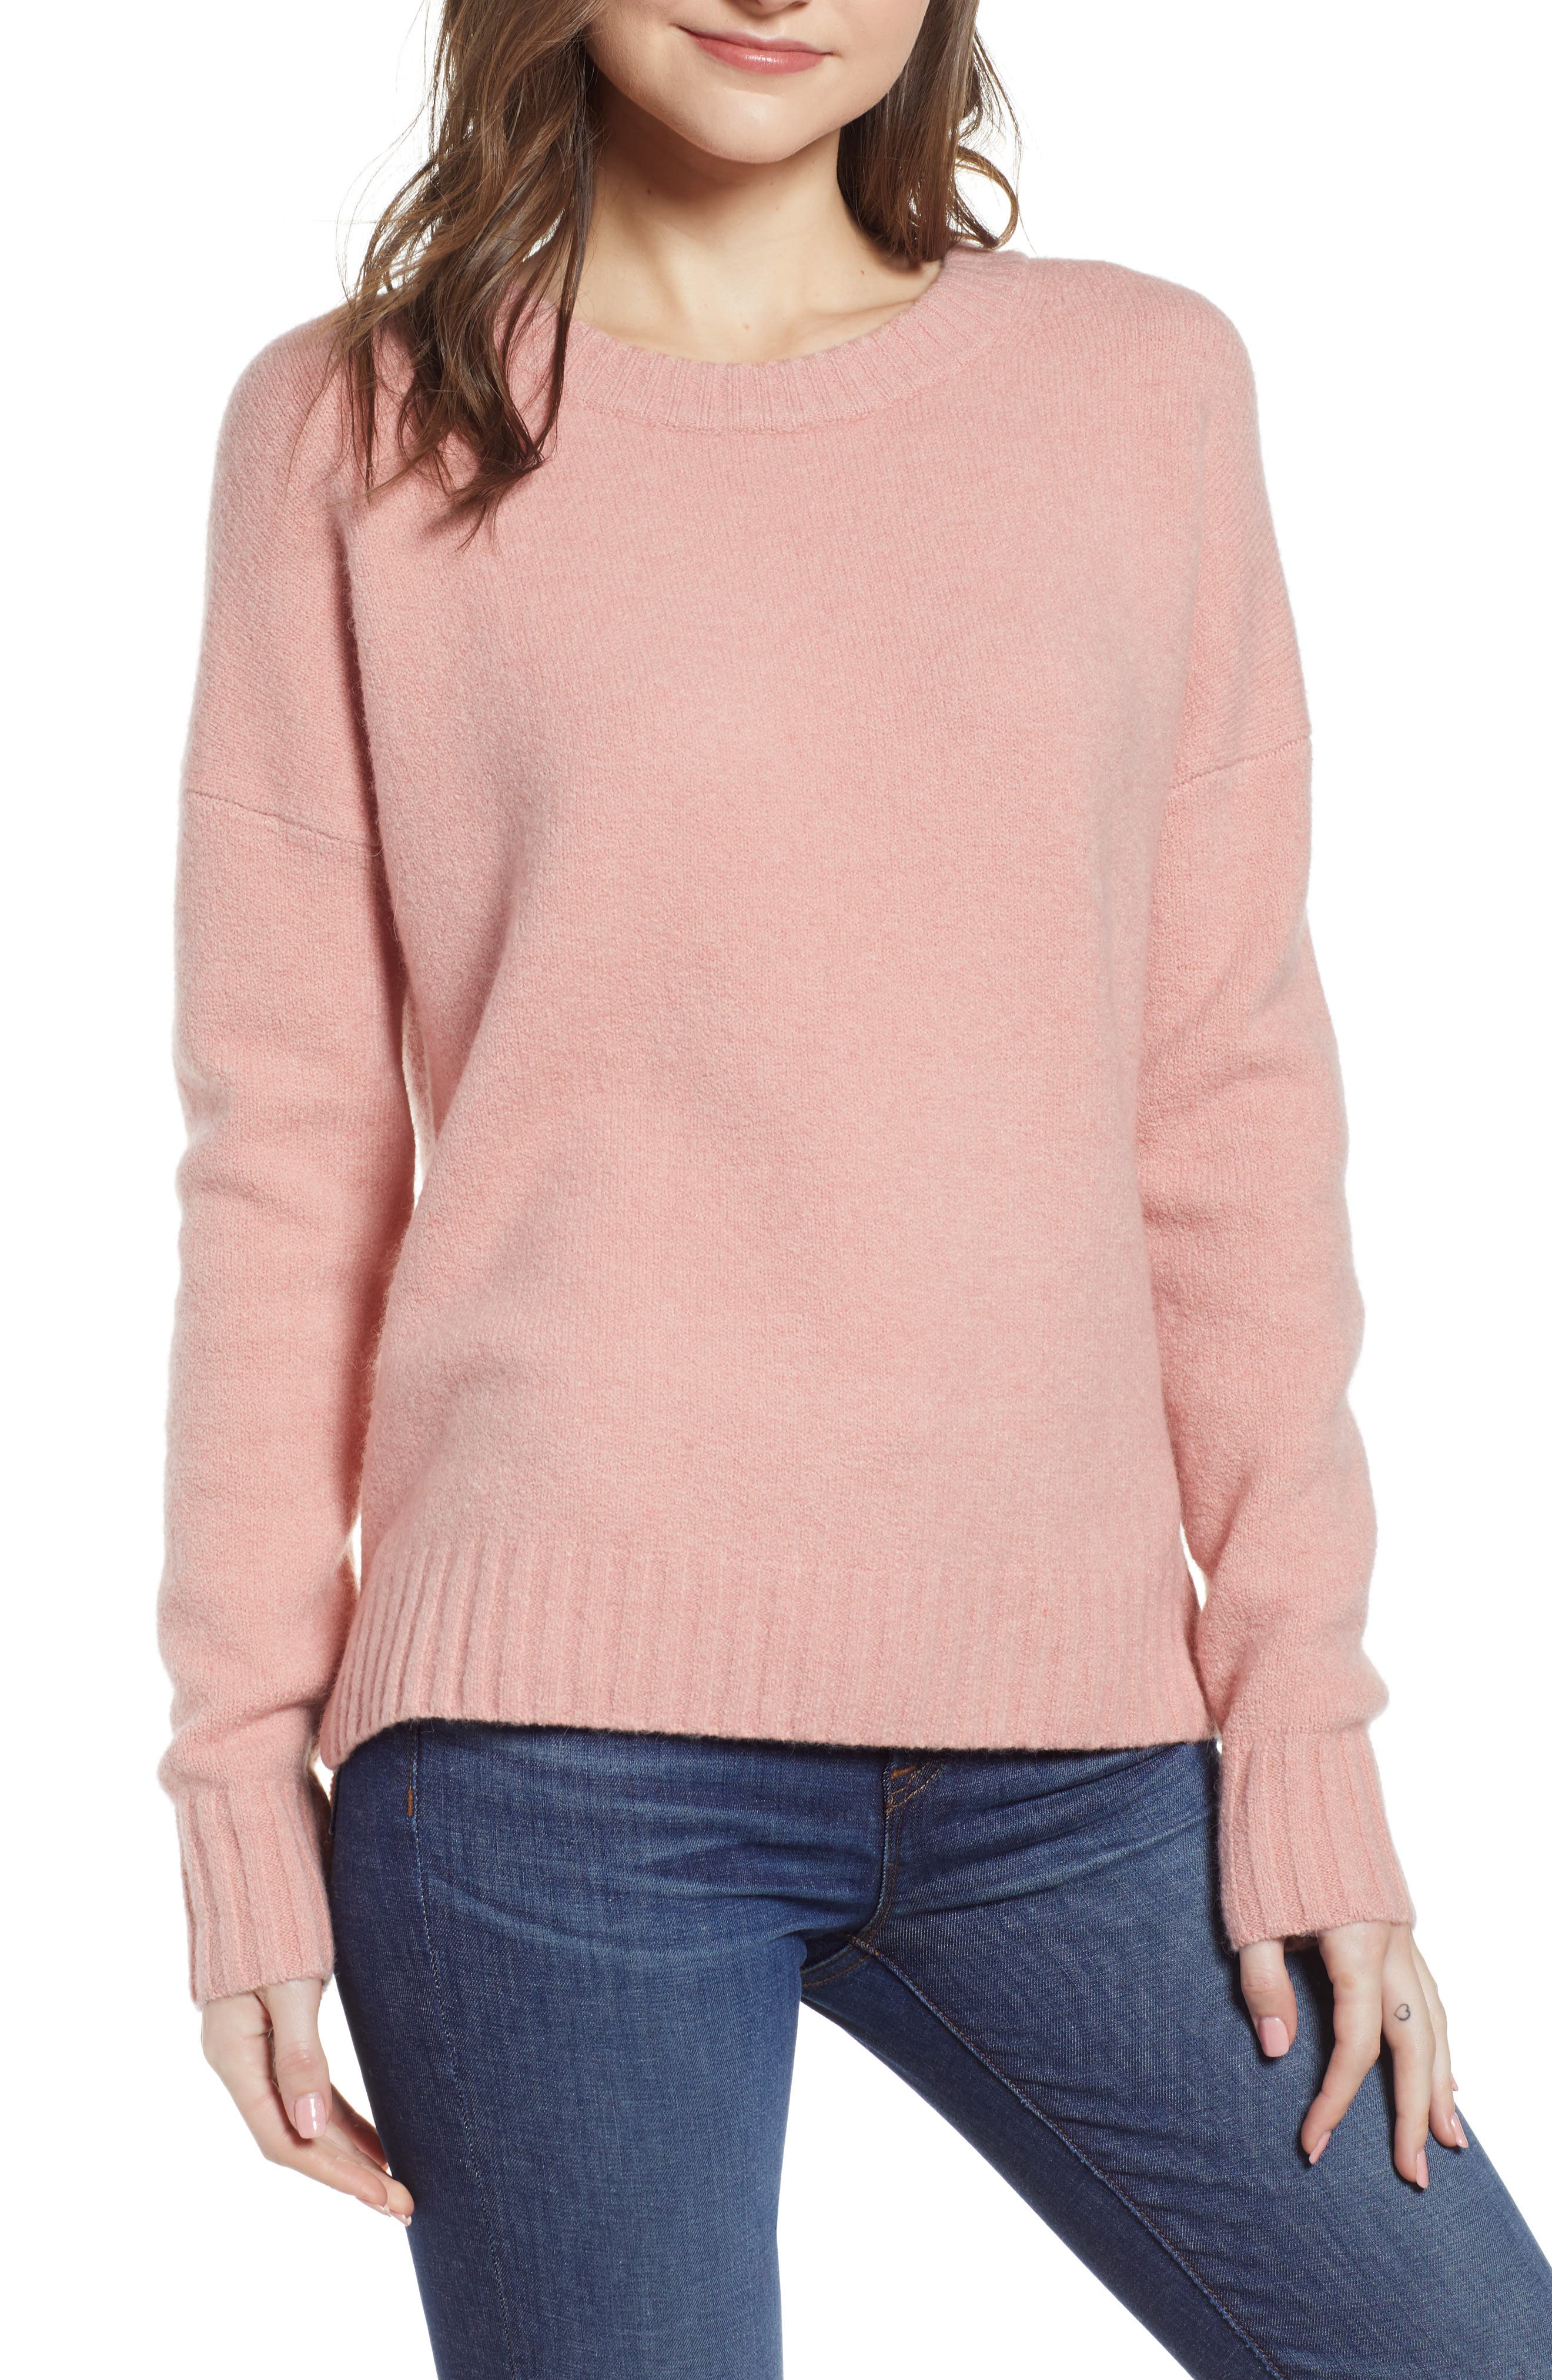 J.crew Supersoft Oversize Crewneck Sweater, Pink